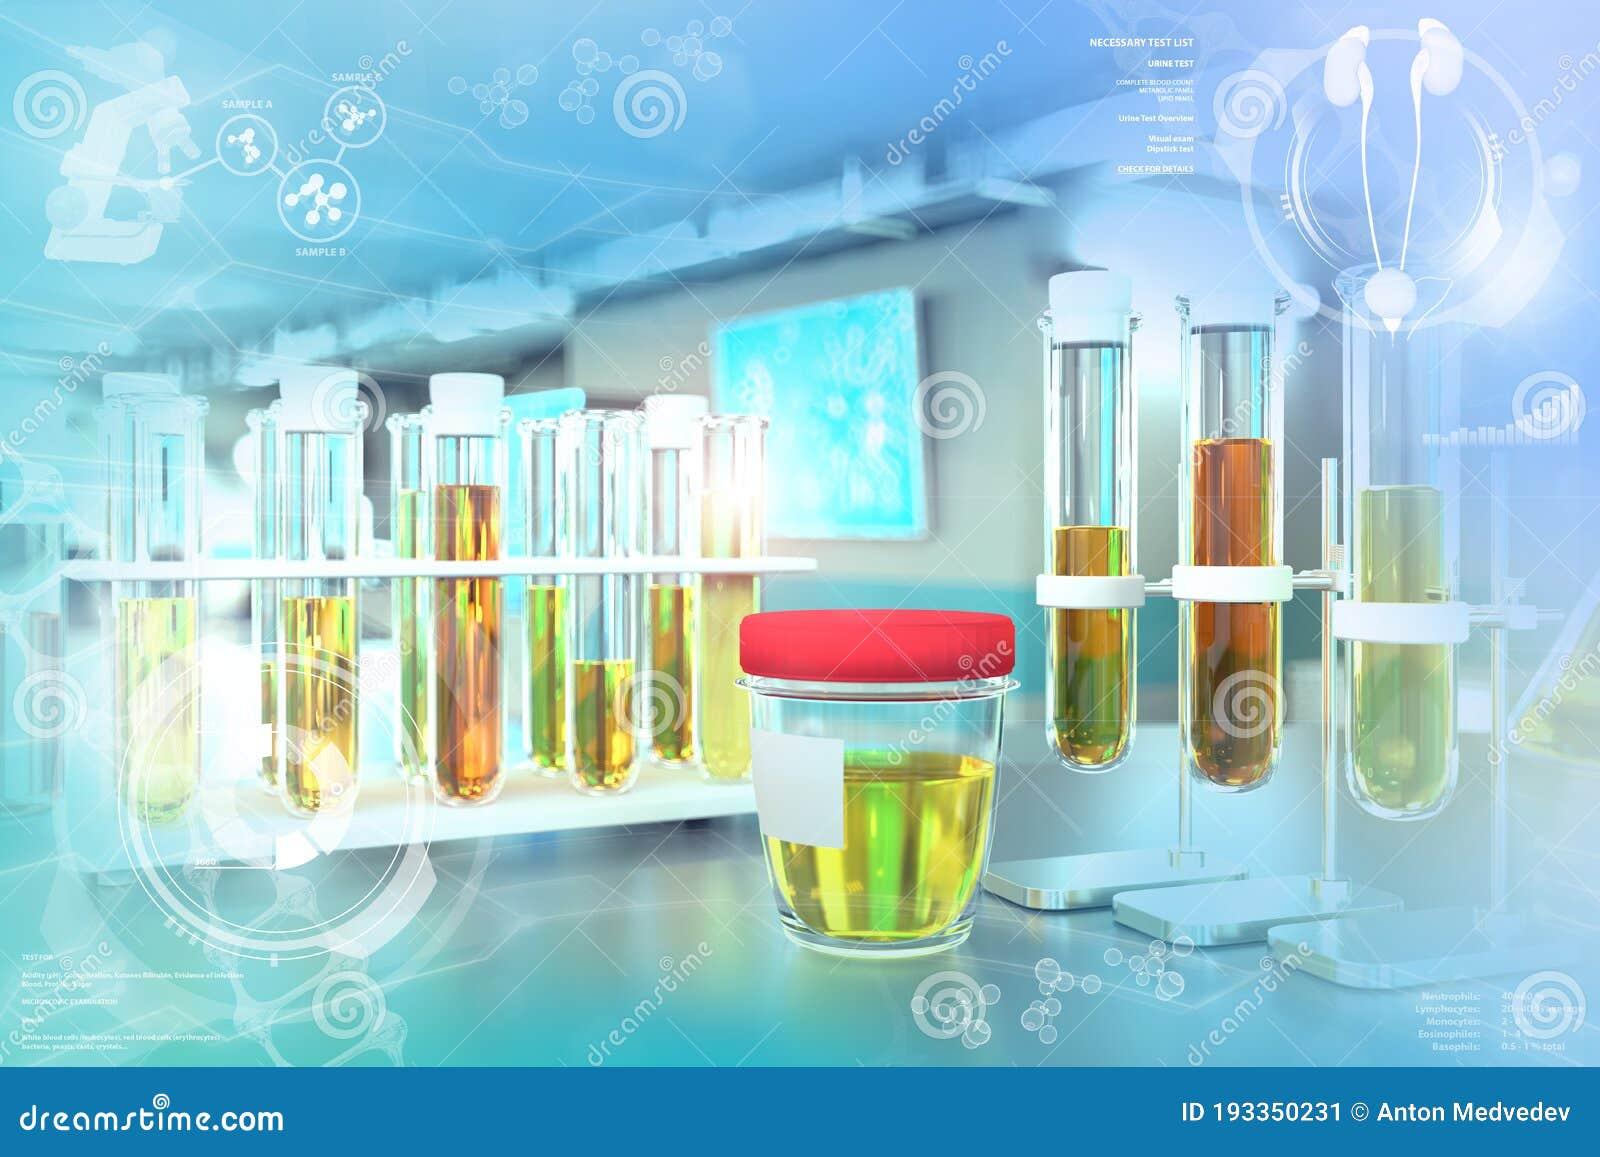 Test Tubes In Modern Microbiology Research Office Urine Quality Test For Ketones Or Kidney Disease Medical 3d Illustration Stock Illustration Illustration Of Clinic Orange 193350231